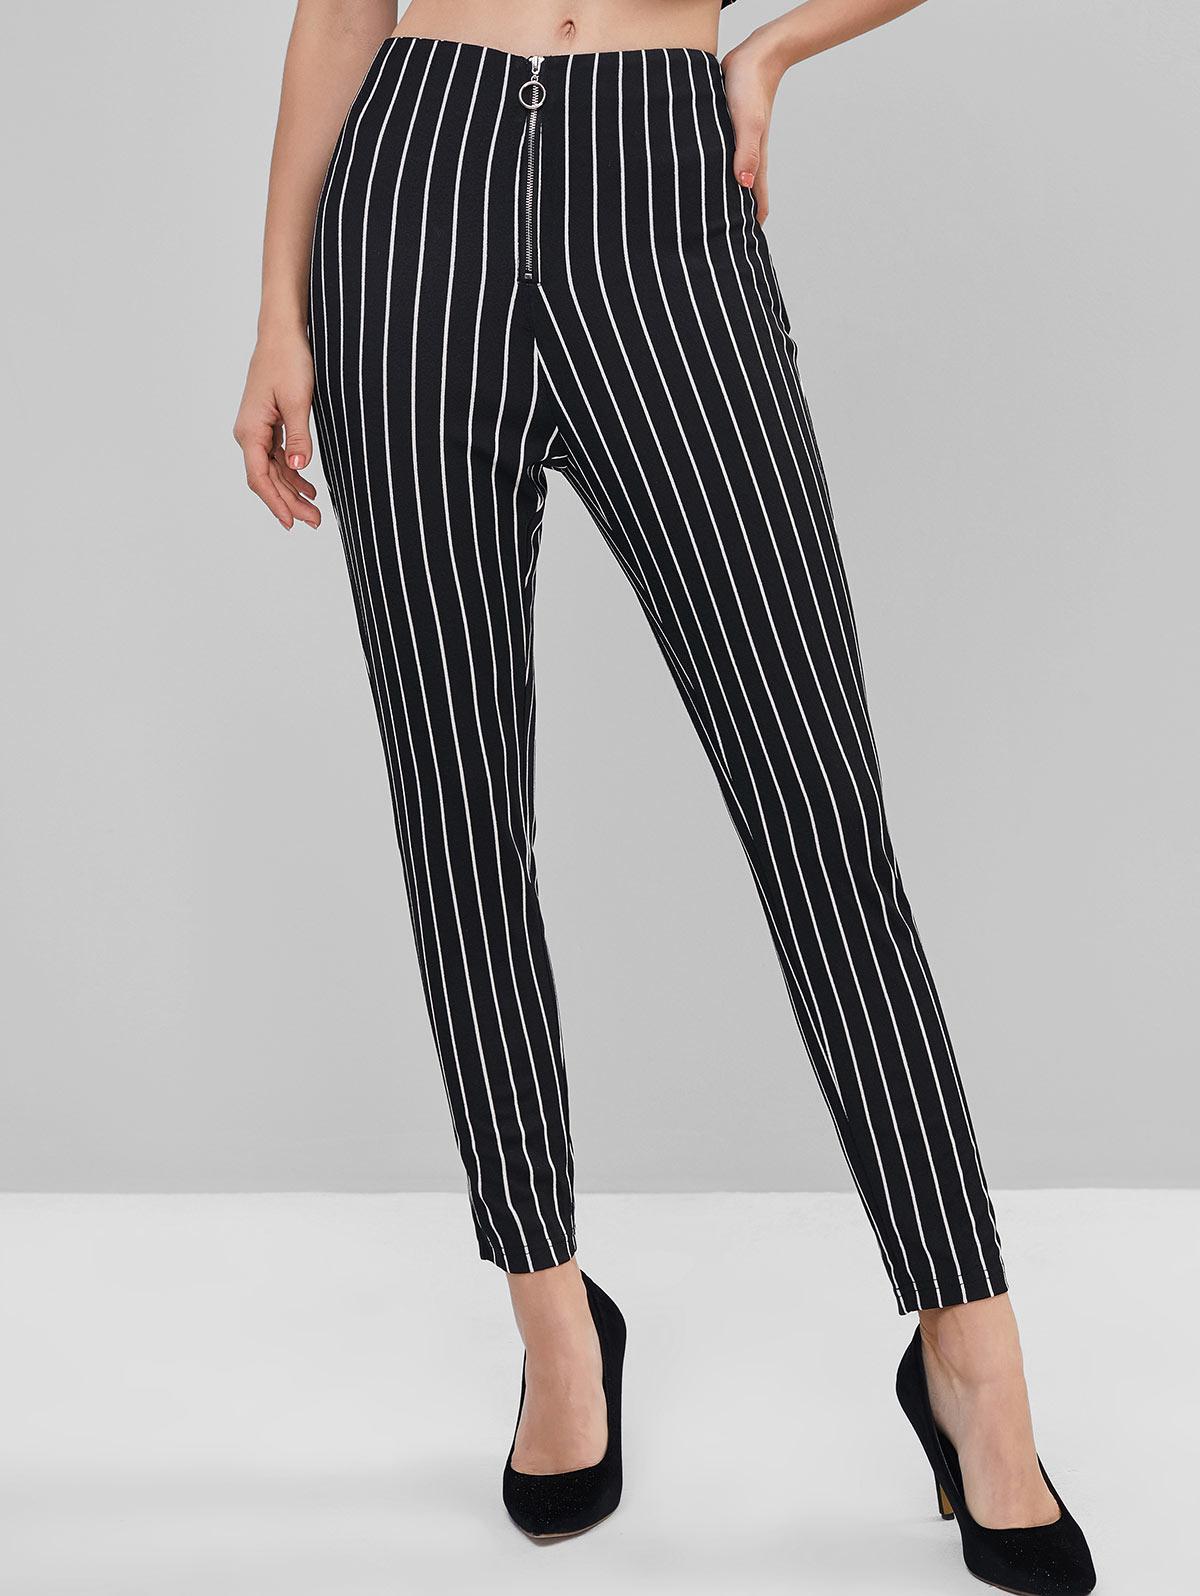 ZAFUL Striped Front Zip Skinny Pants фото